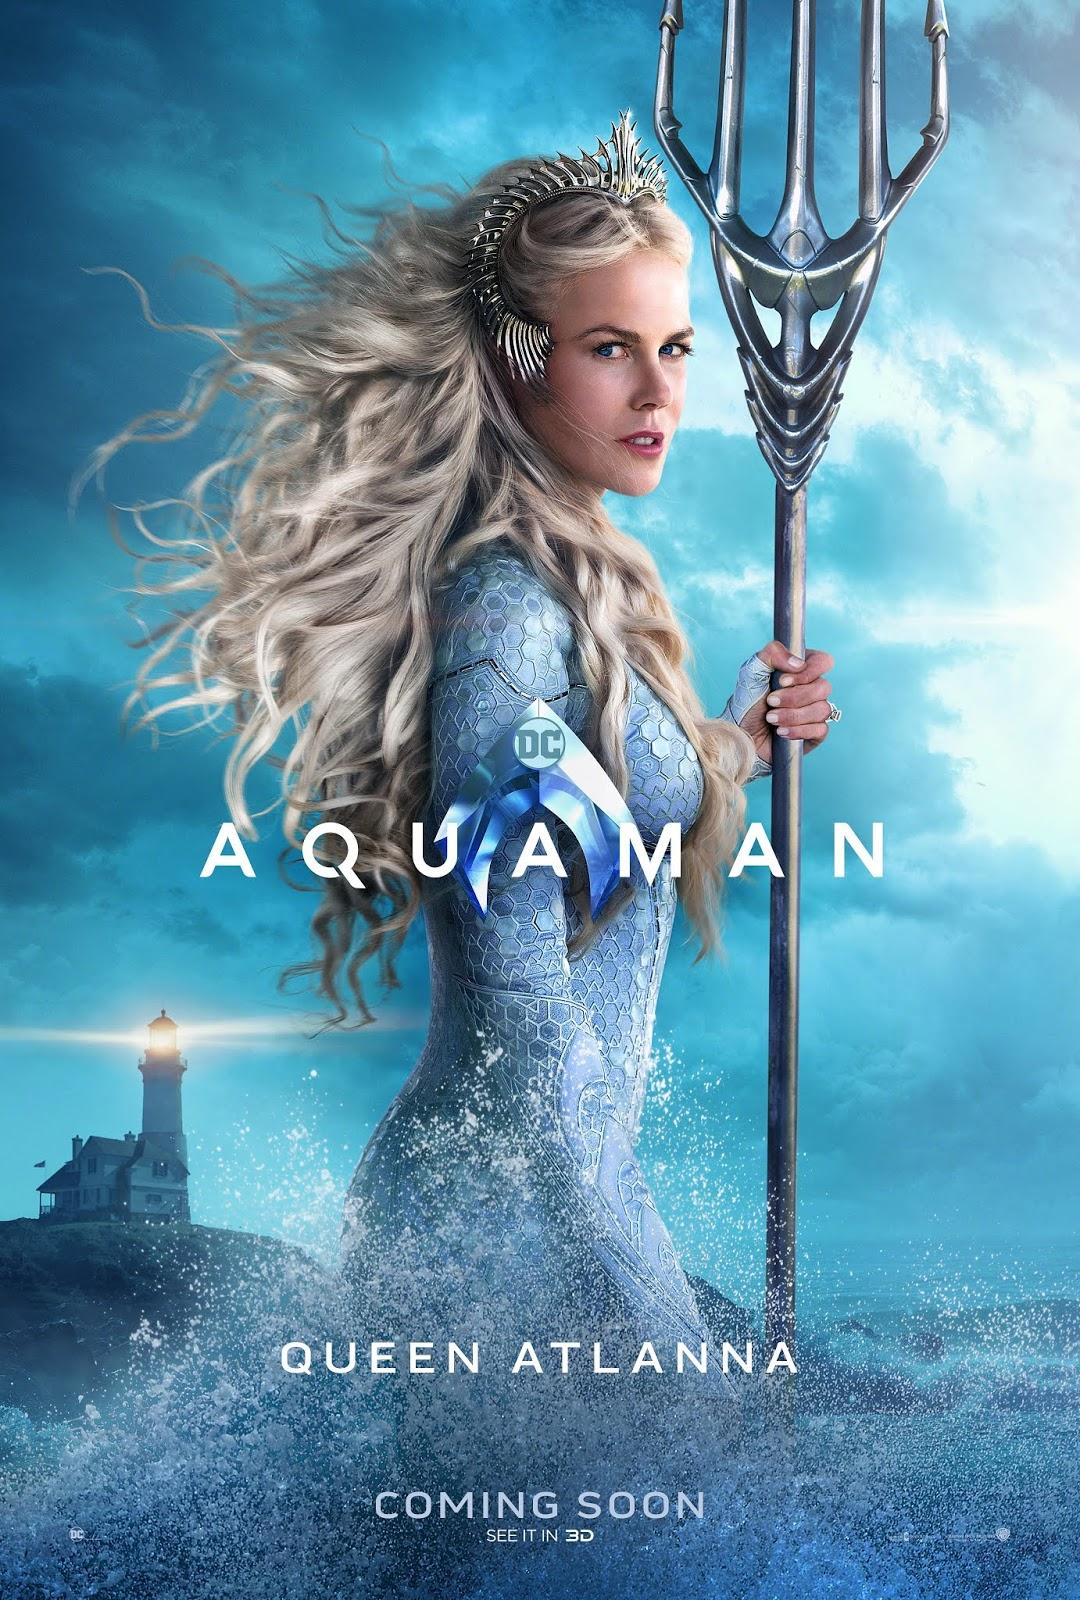 aquaman character poster